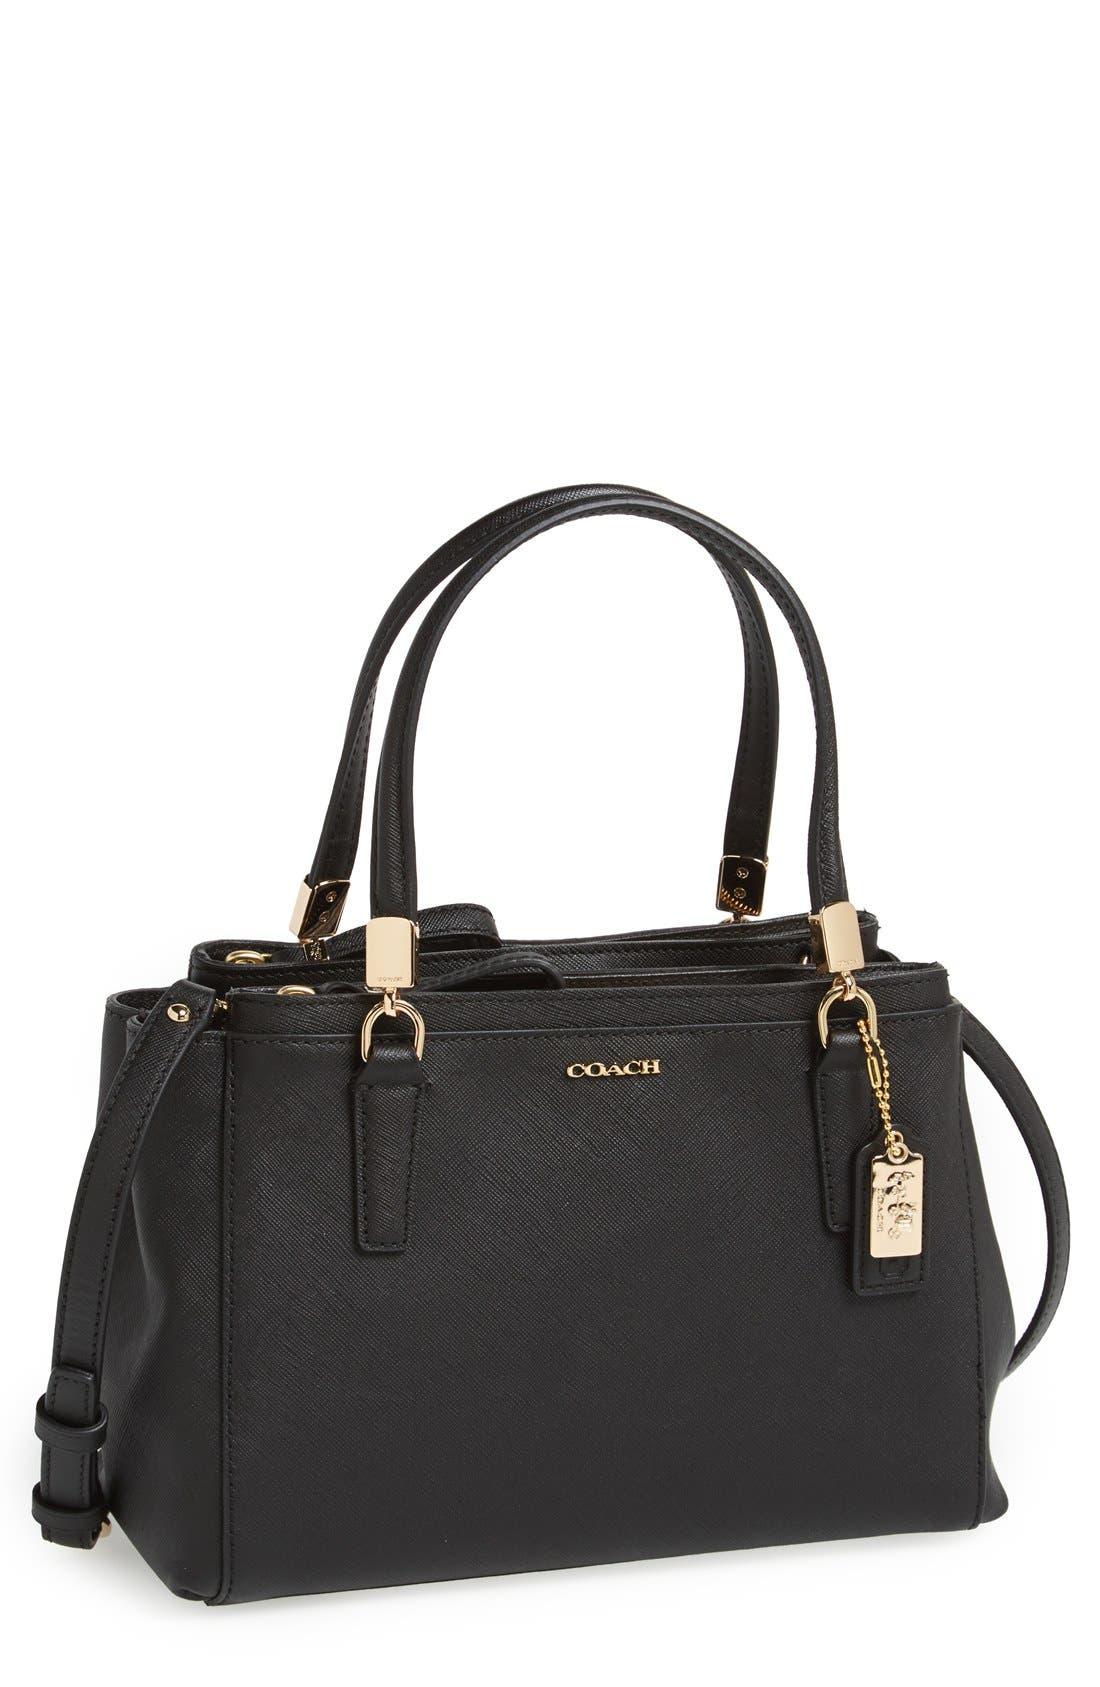 COACH, 'Madison - Mini Christie' Saffiano Leather Satchel, Main thumbnail 1, color, 001